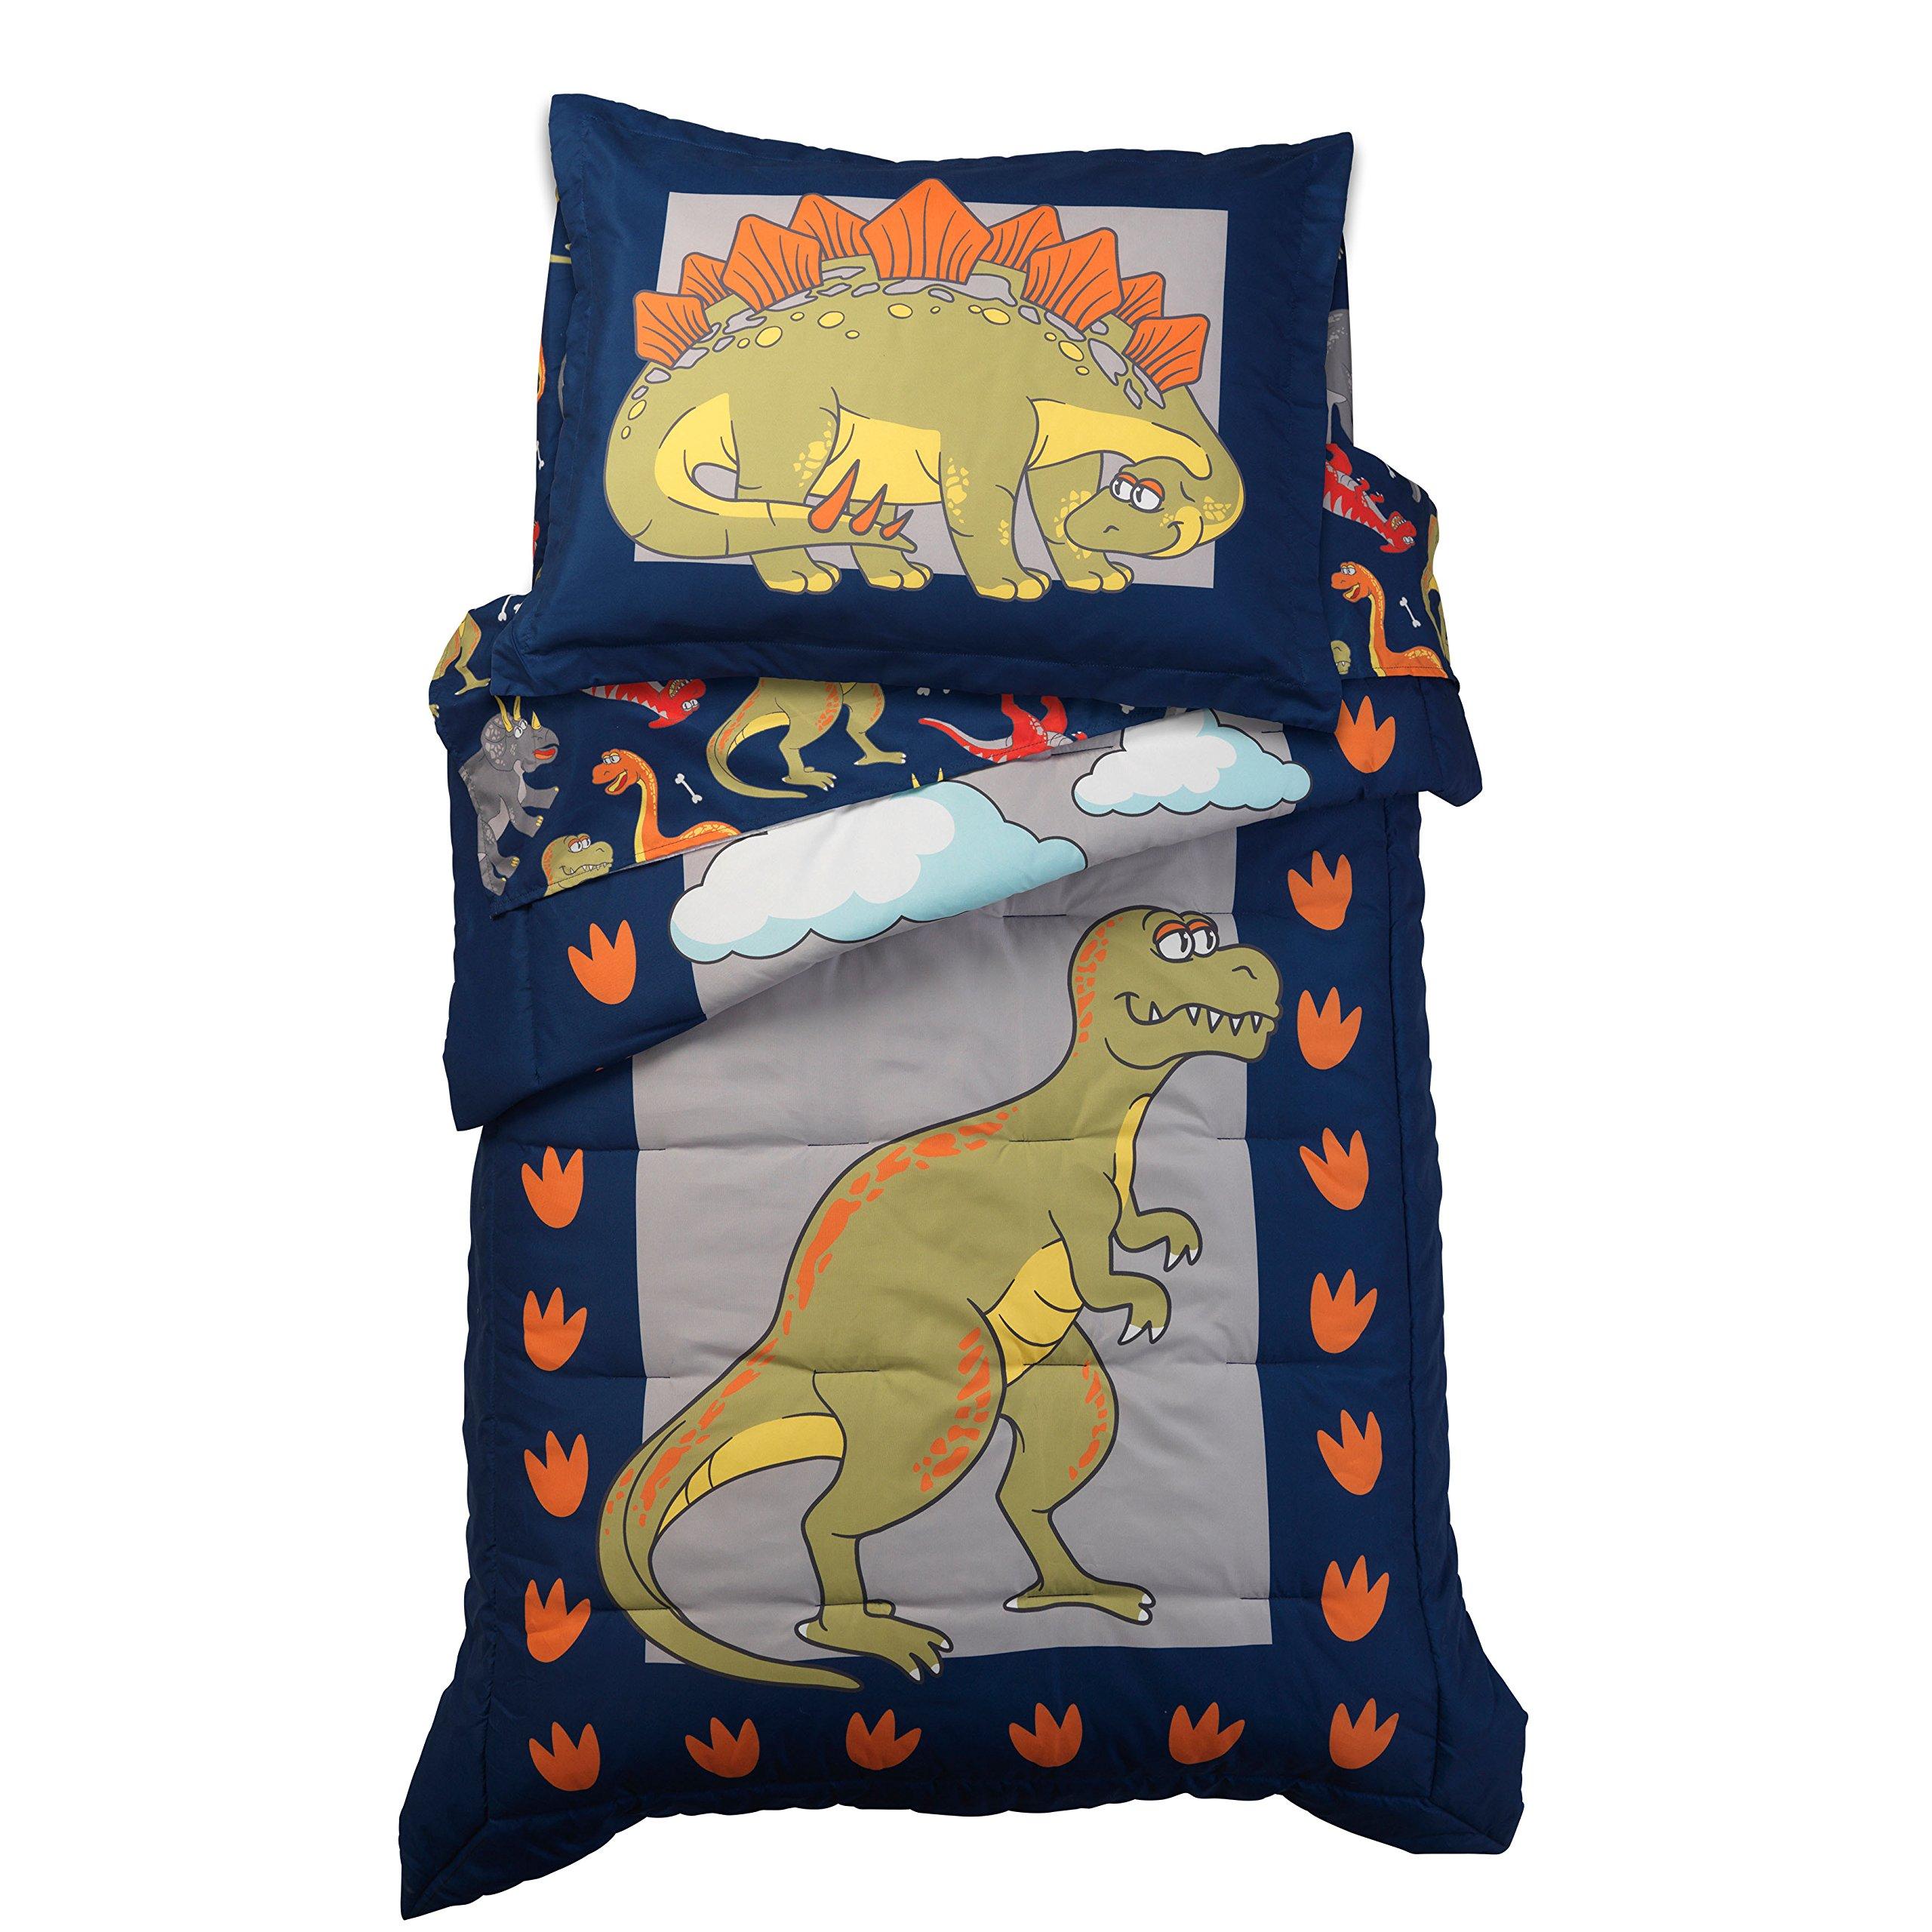 KidKraft Dinosaur Toddler Bedding